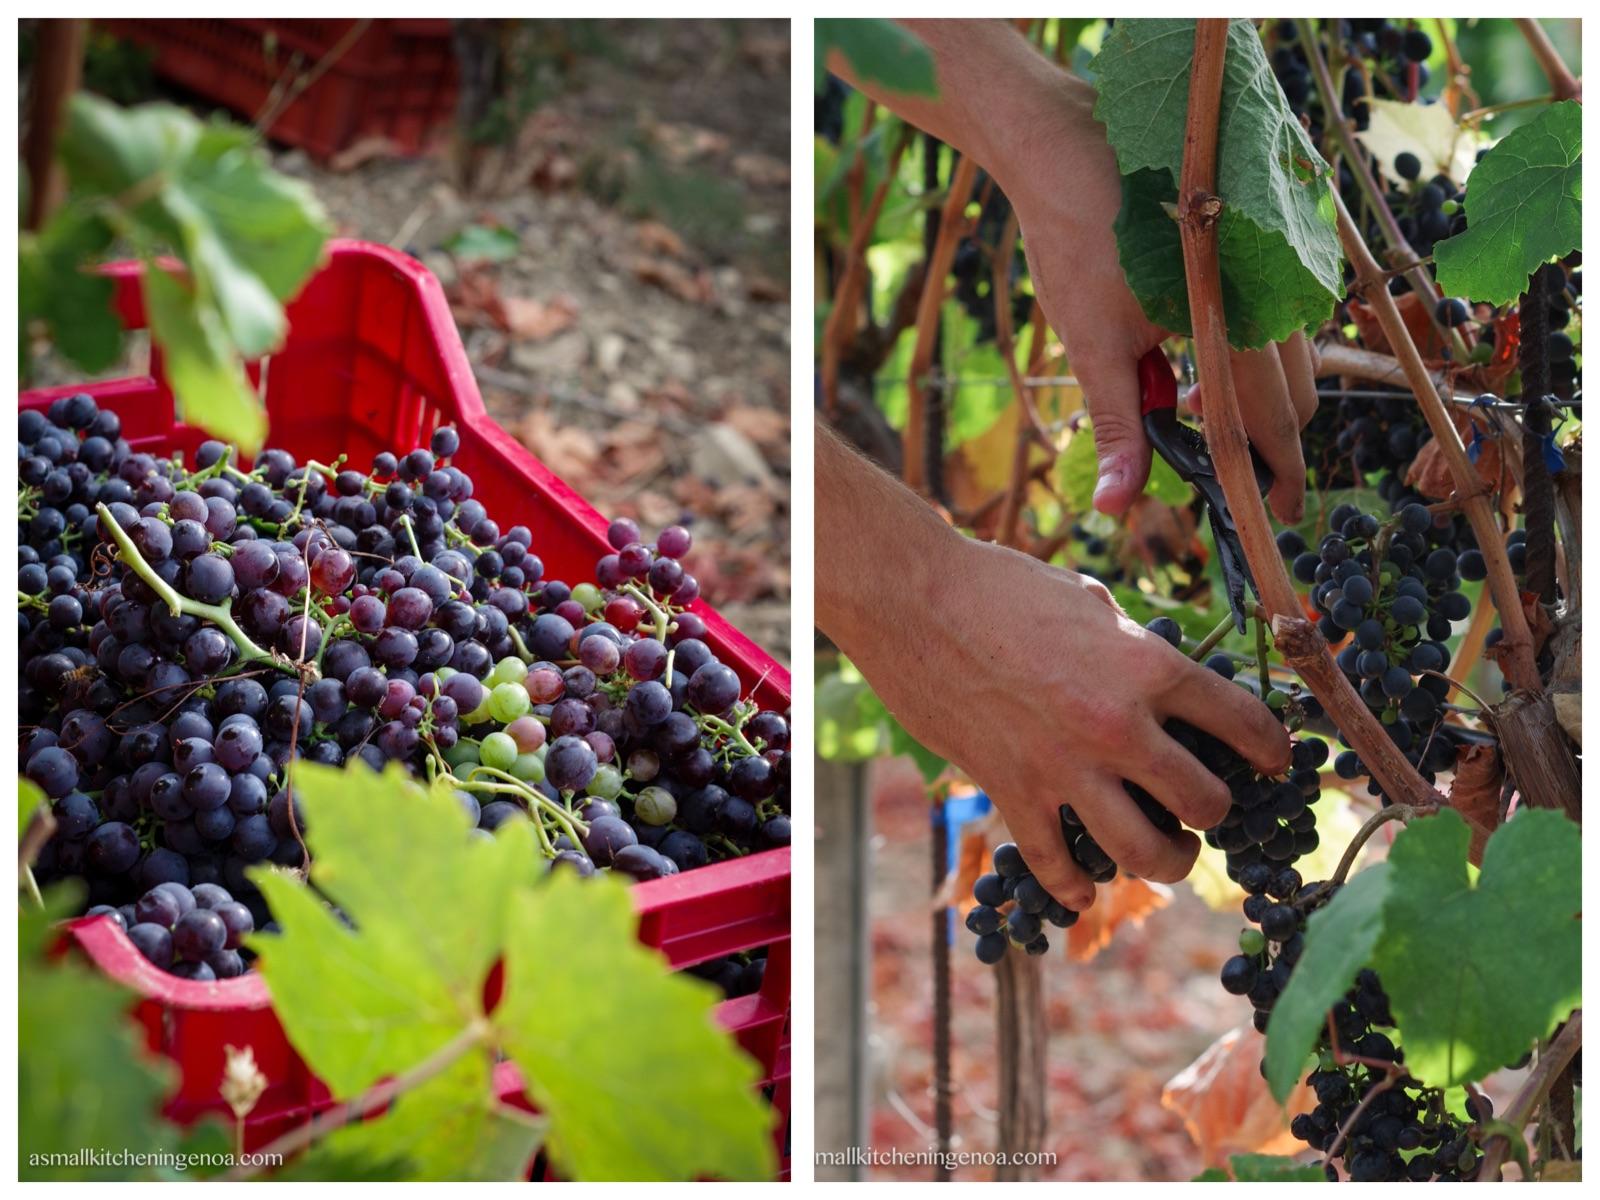 Italian Riviera wines and grapevine varieties